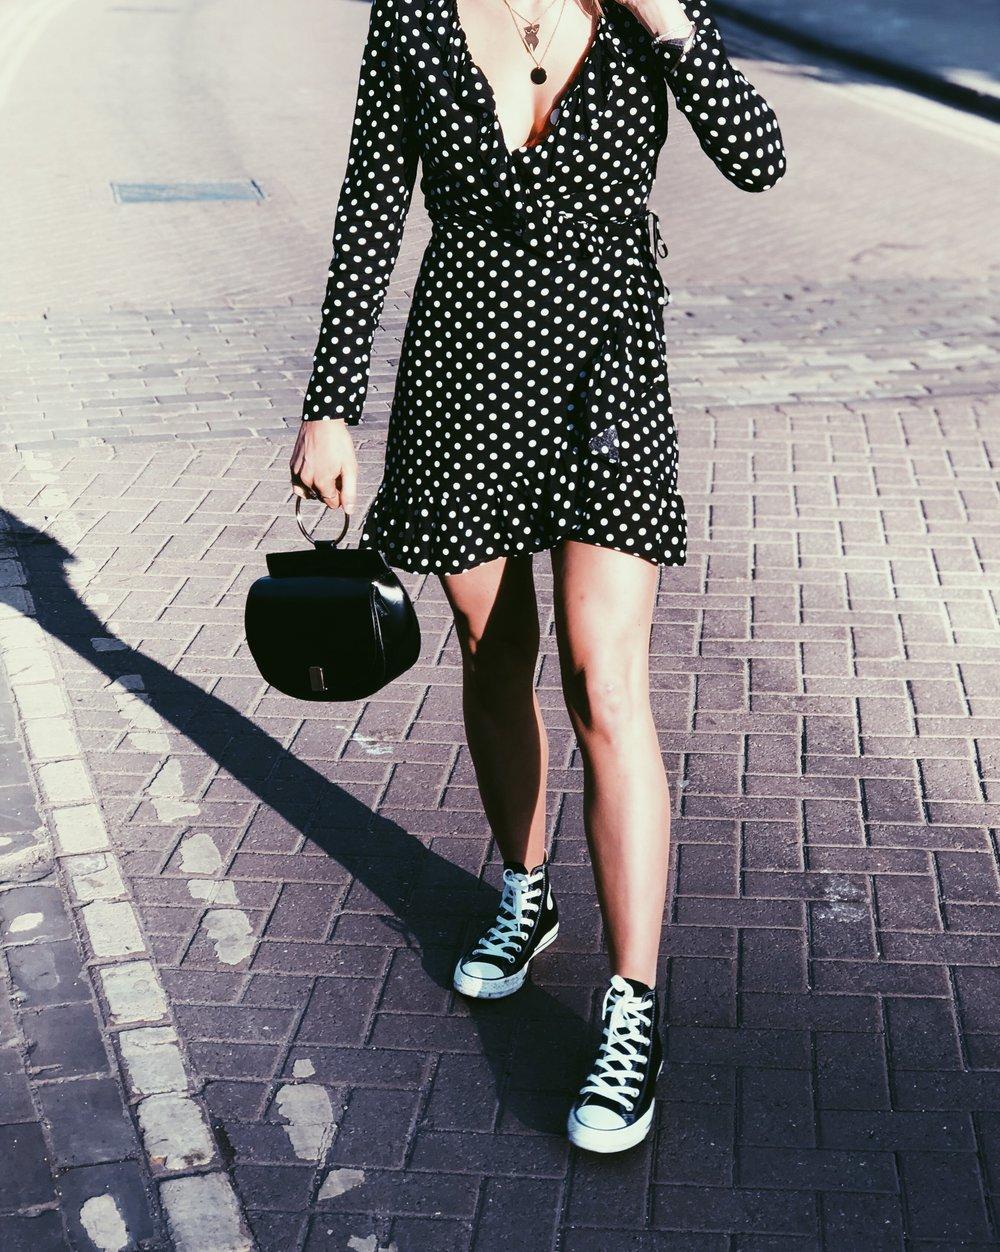 Dress: Miss Selfridge, Bag: Primark, Shoe: Converse